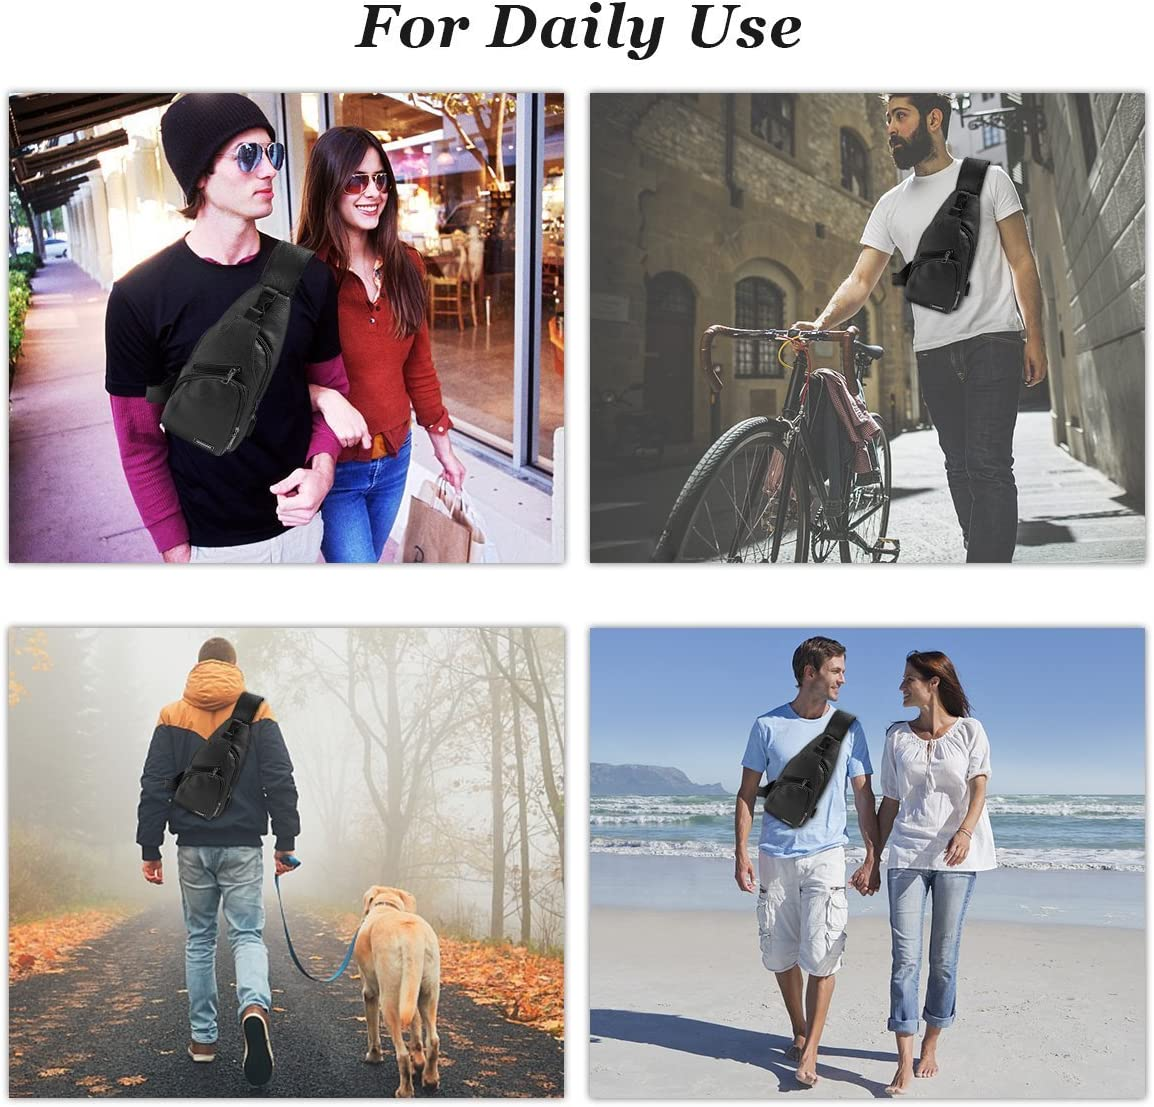 Travel Shoulder Cross Body Bag Sling Backpack Multipurpose Daypack Chest Bag with USB black